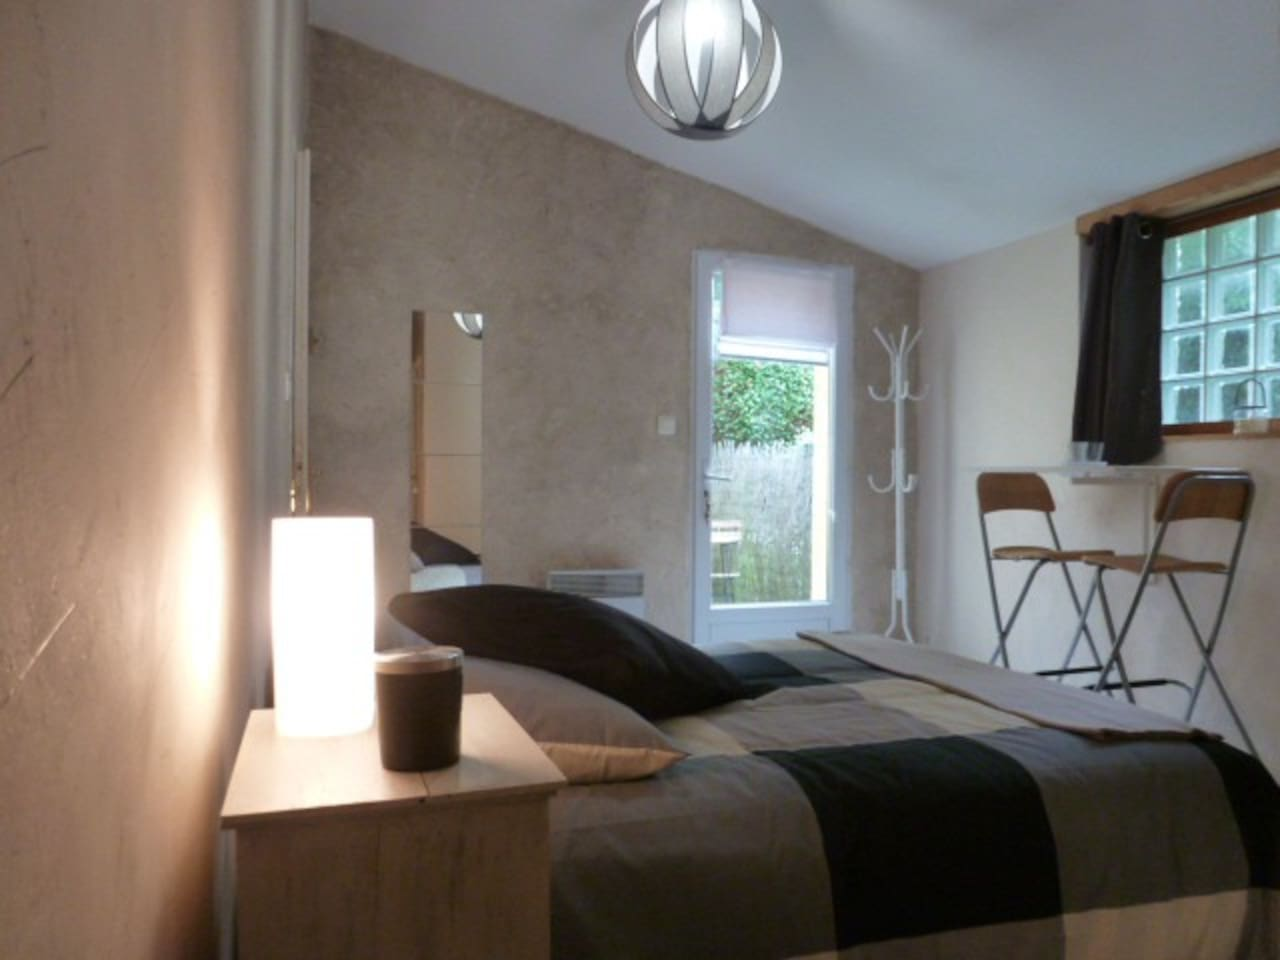 Chambre privée avec son coin terrasse aménagé